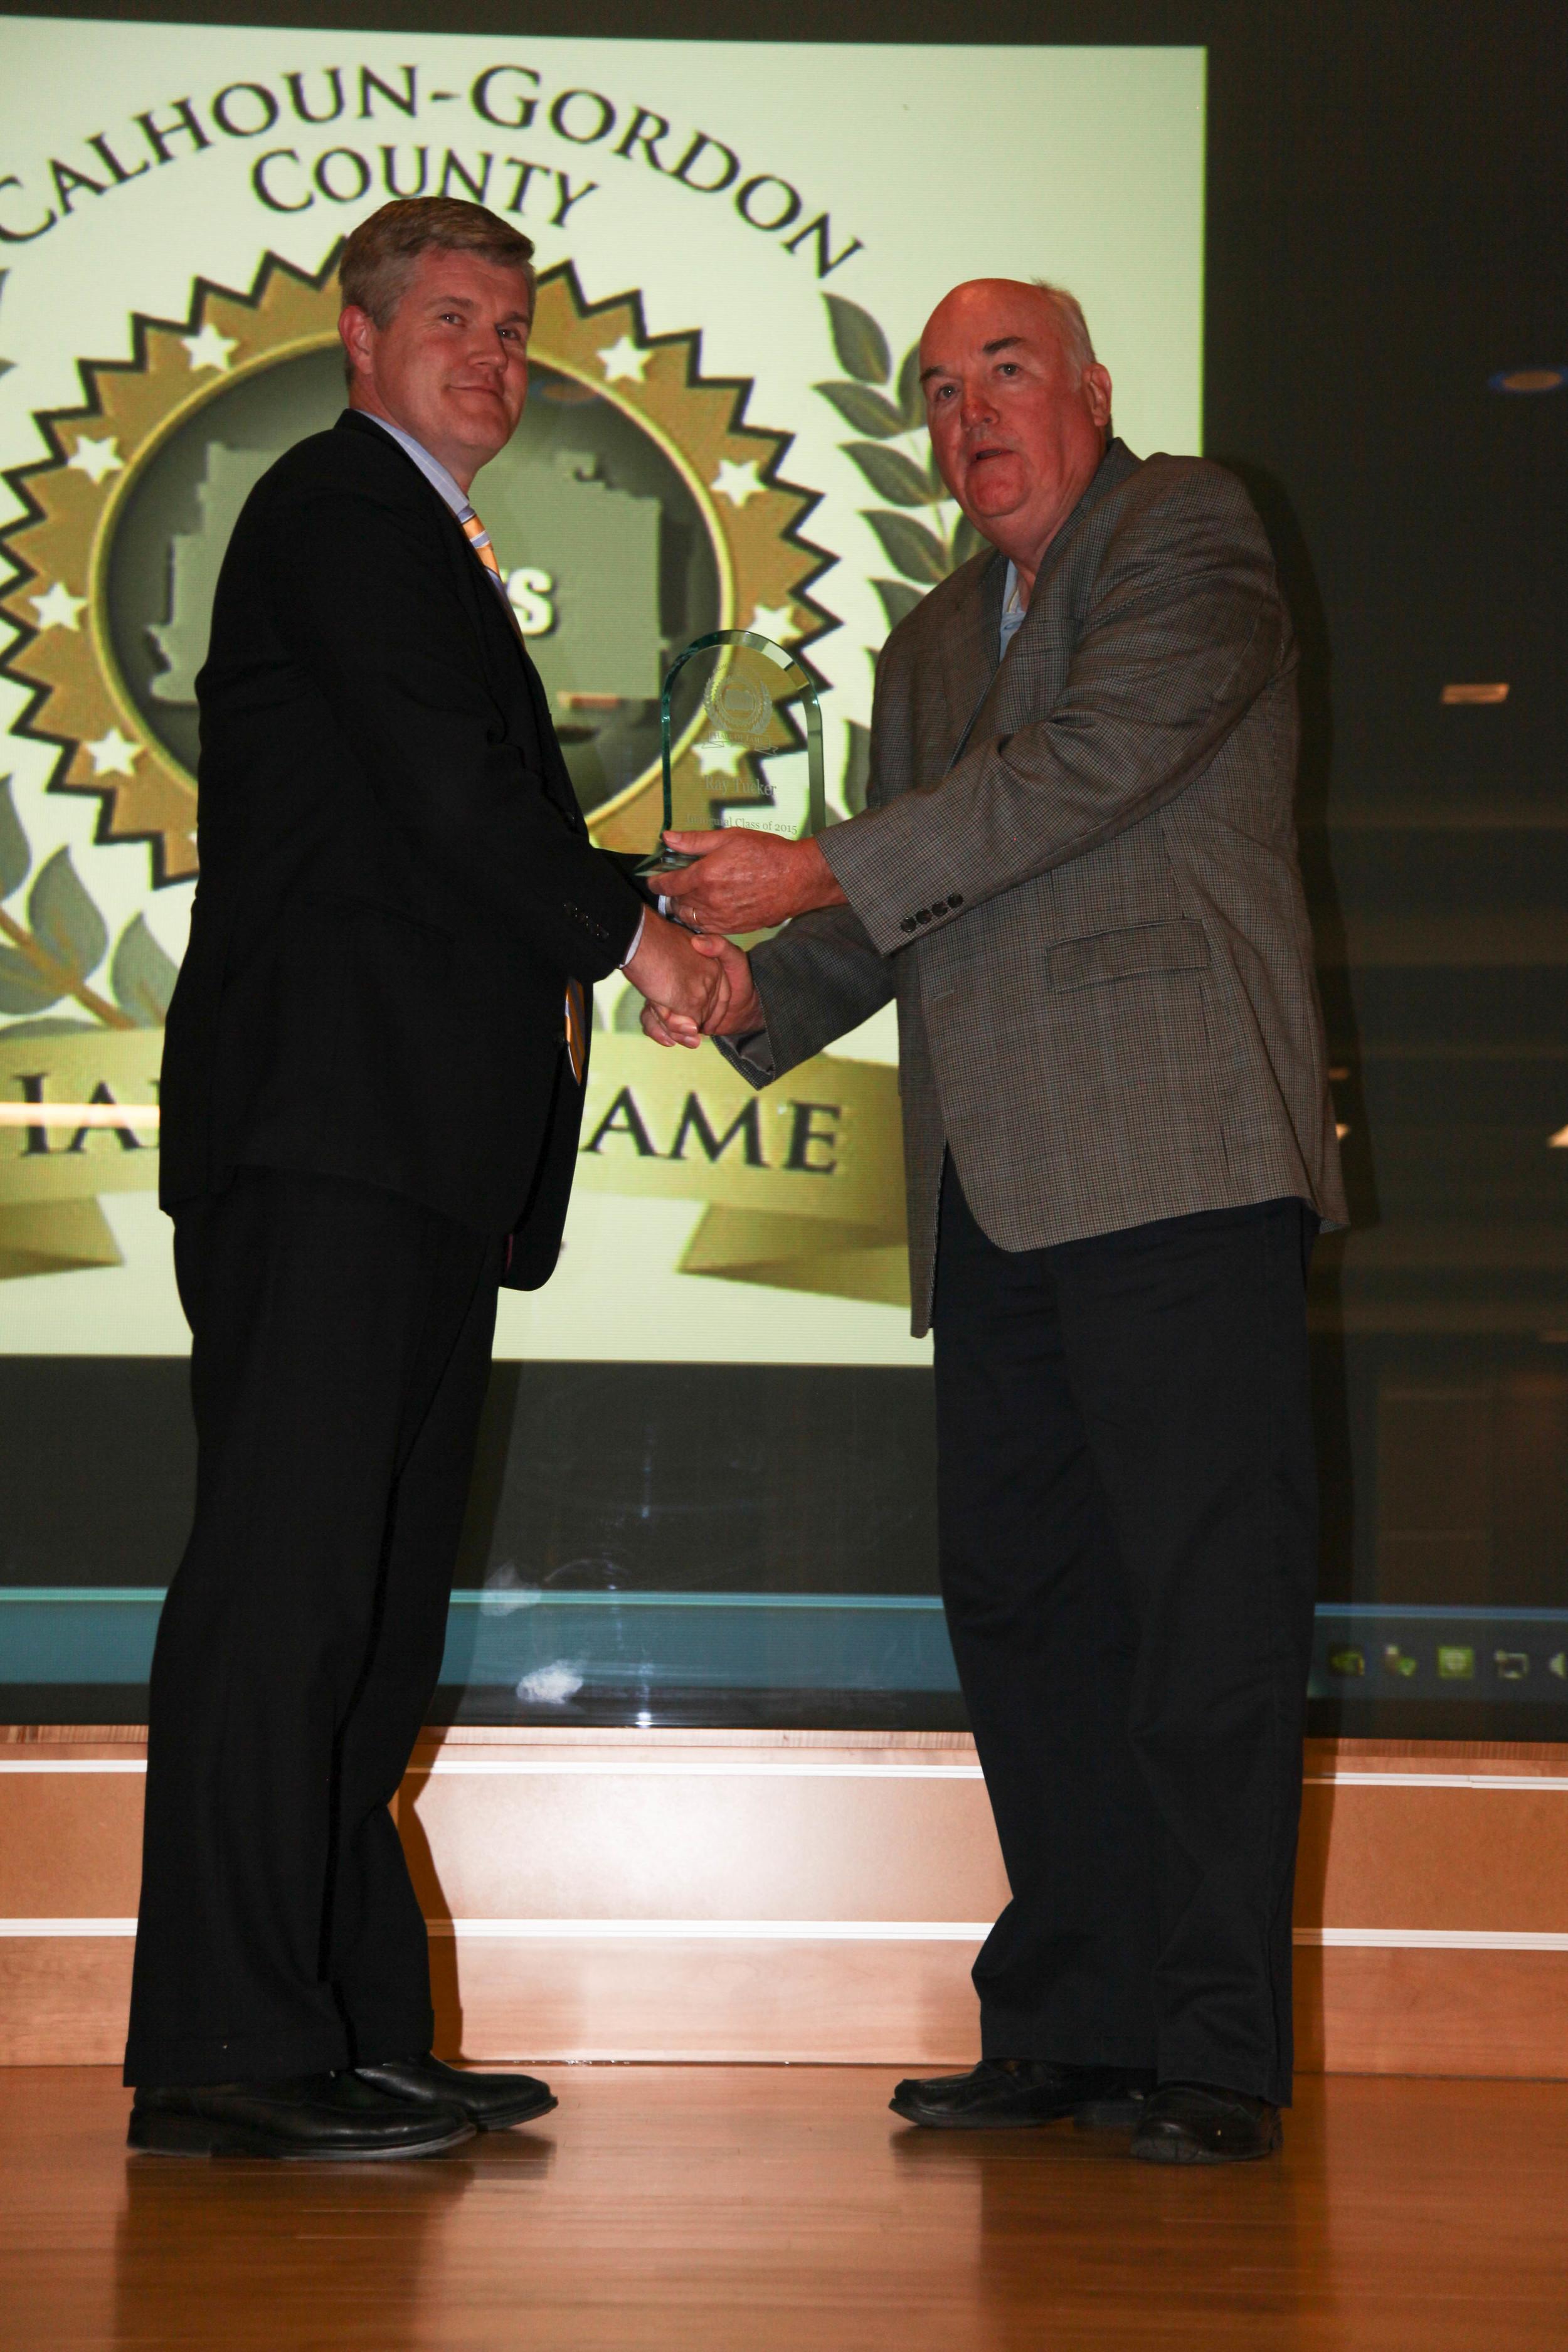 Calhoun-Gordon-County-Sports-Hall-of-Fame-2015-148.jpg